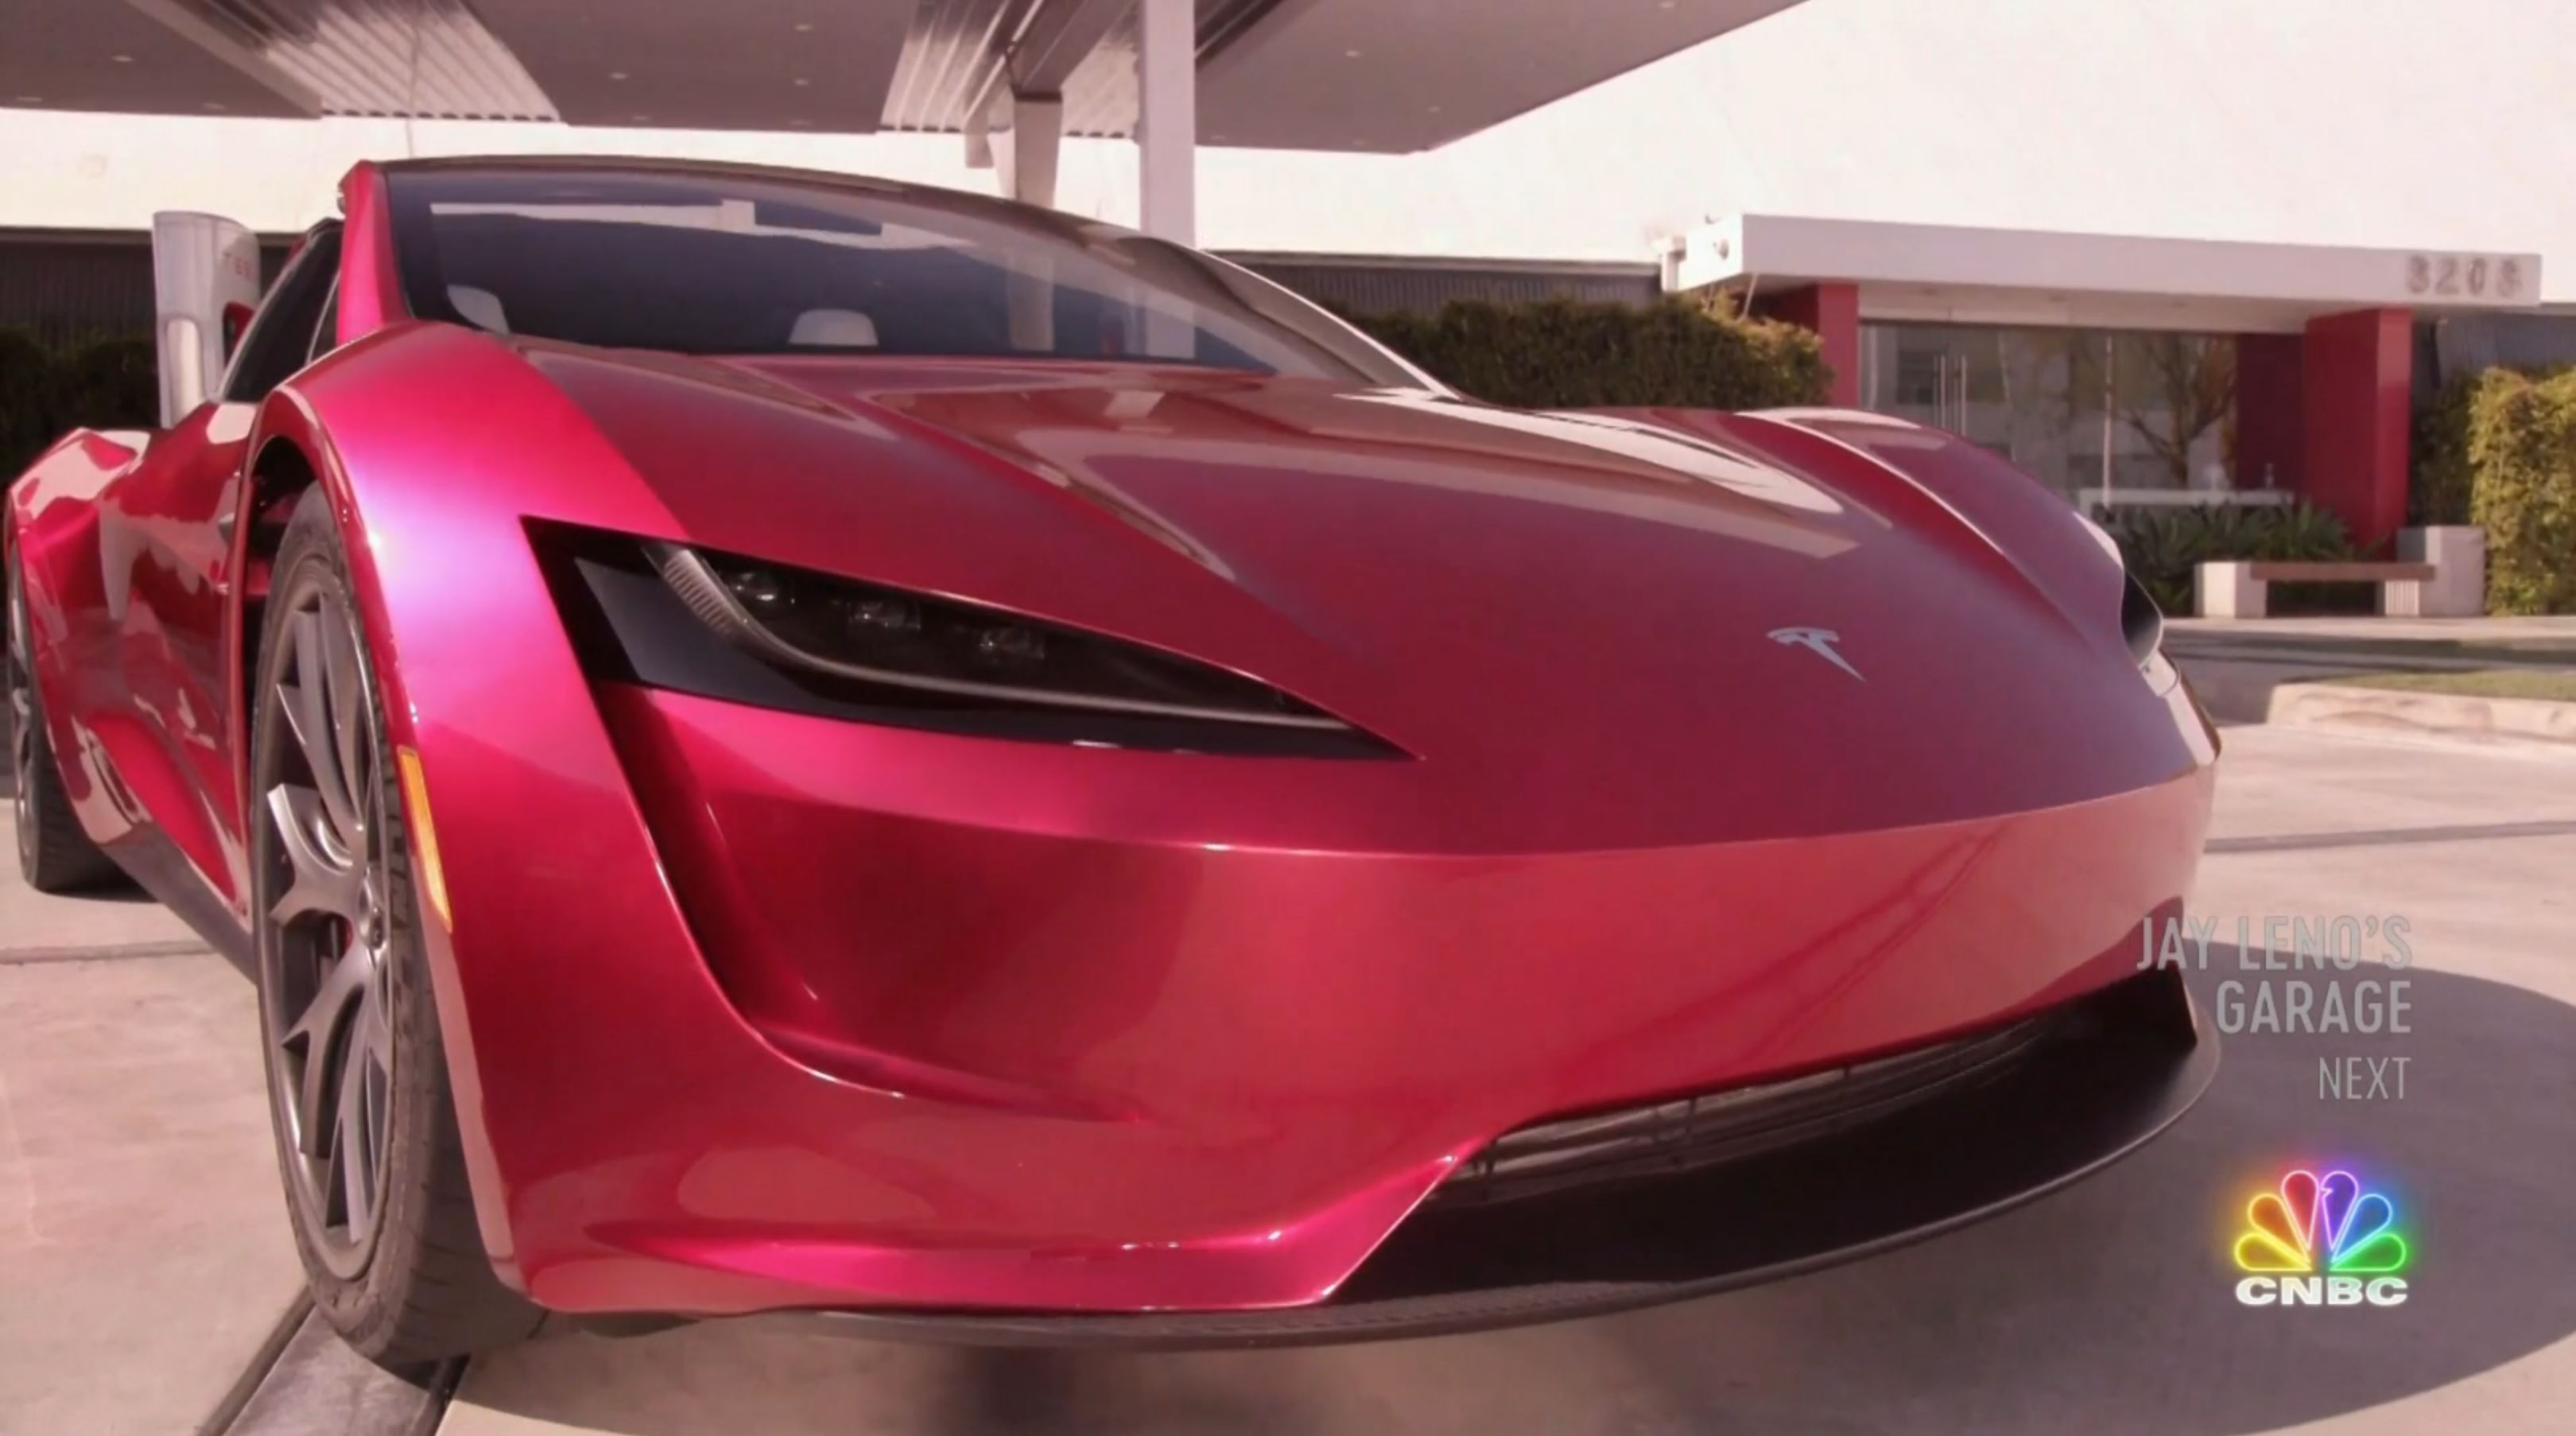 Jay Leno Tesla Franz segment (NBC) 18